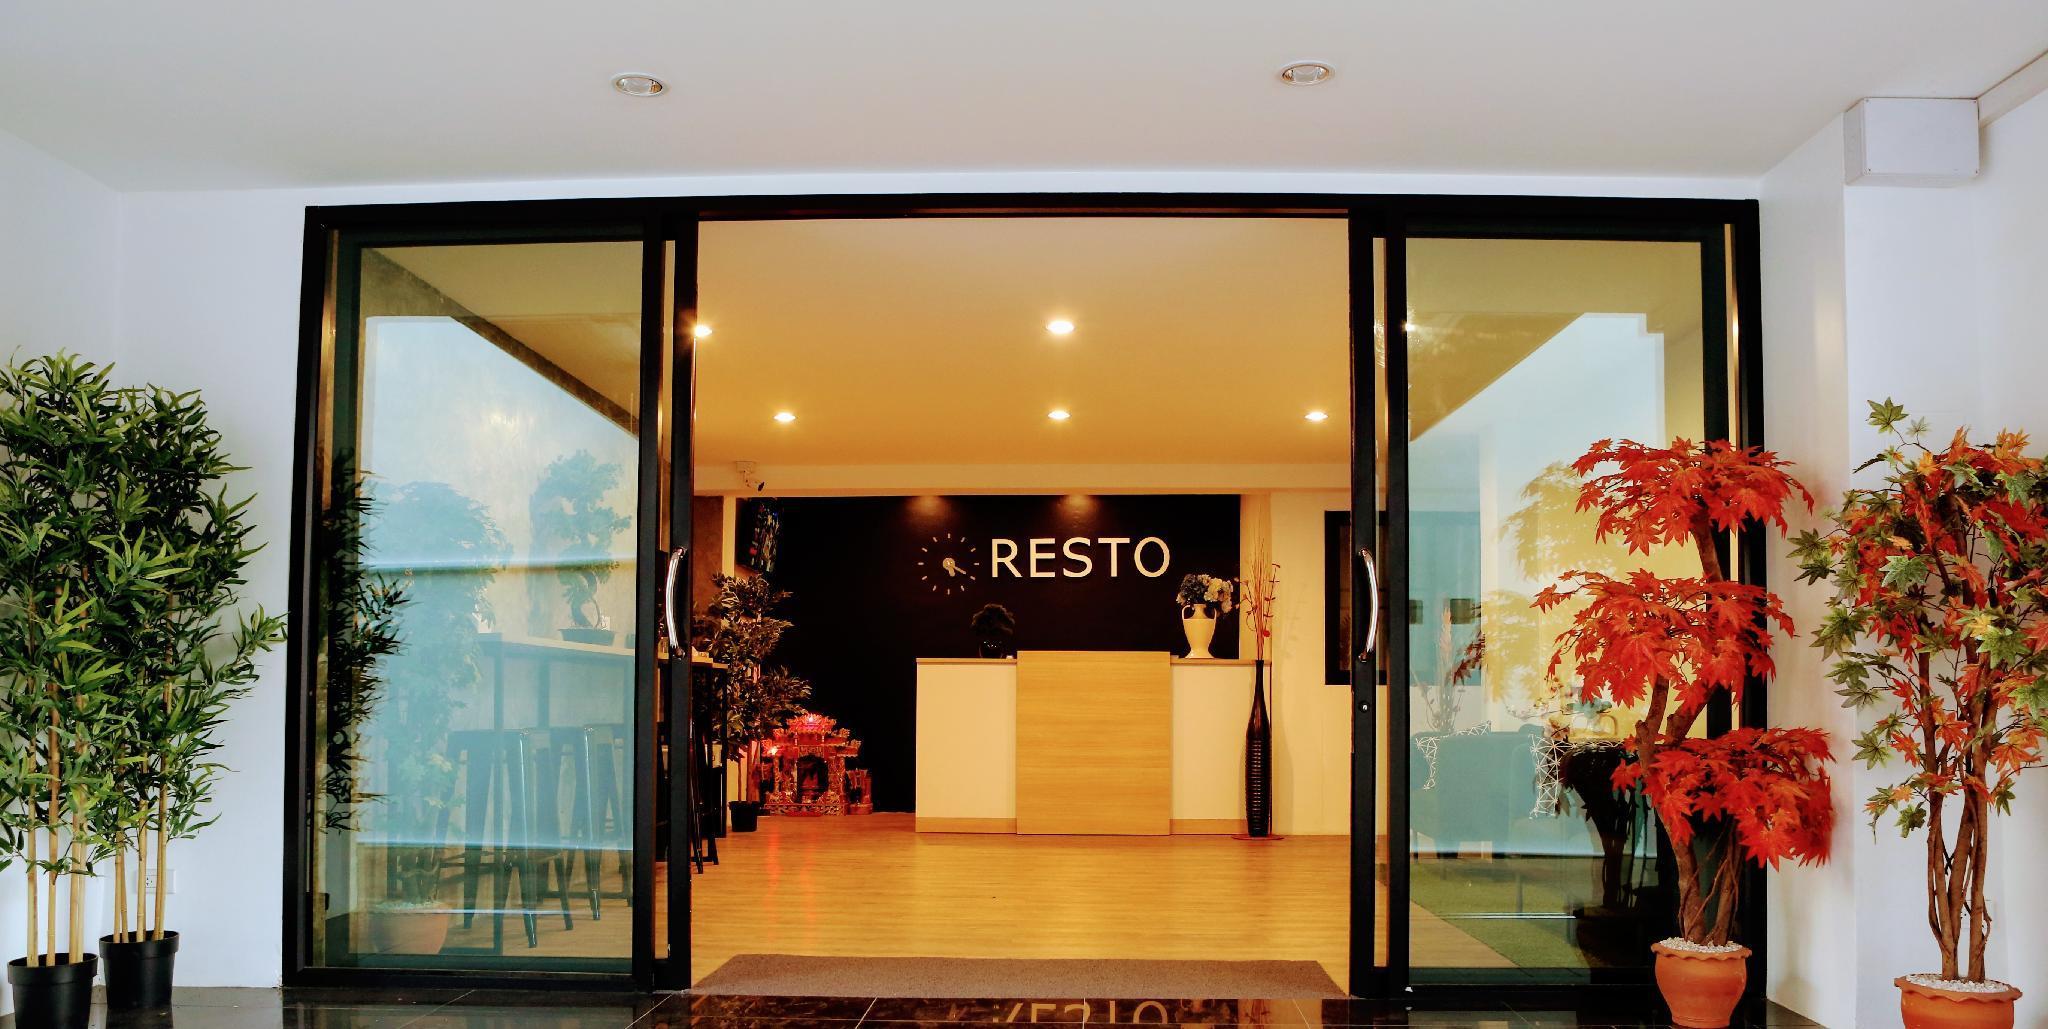 The Resto, Muang Udon Thani